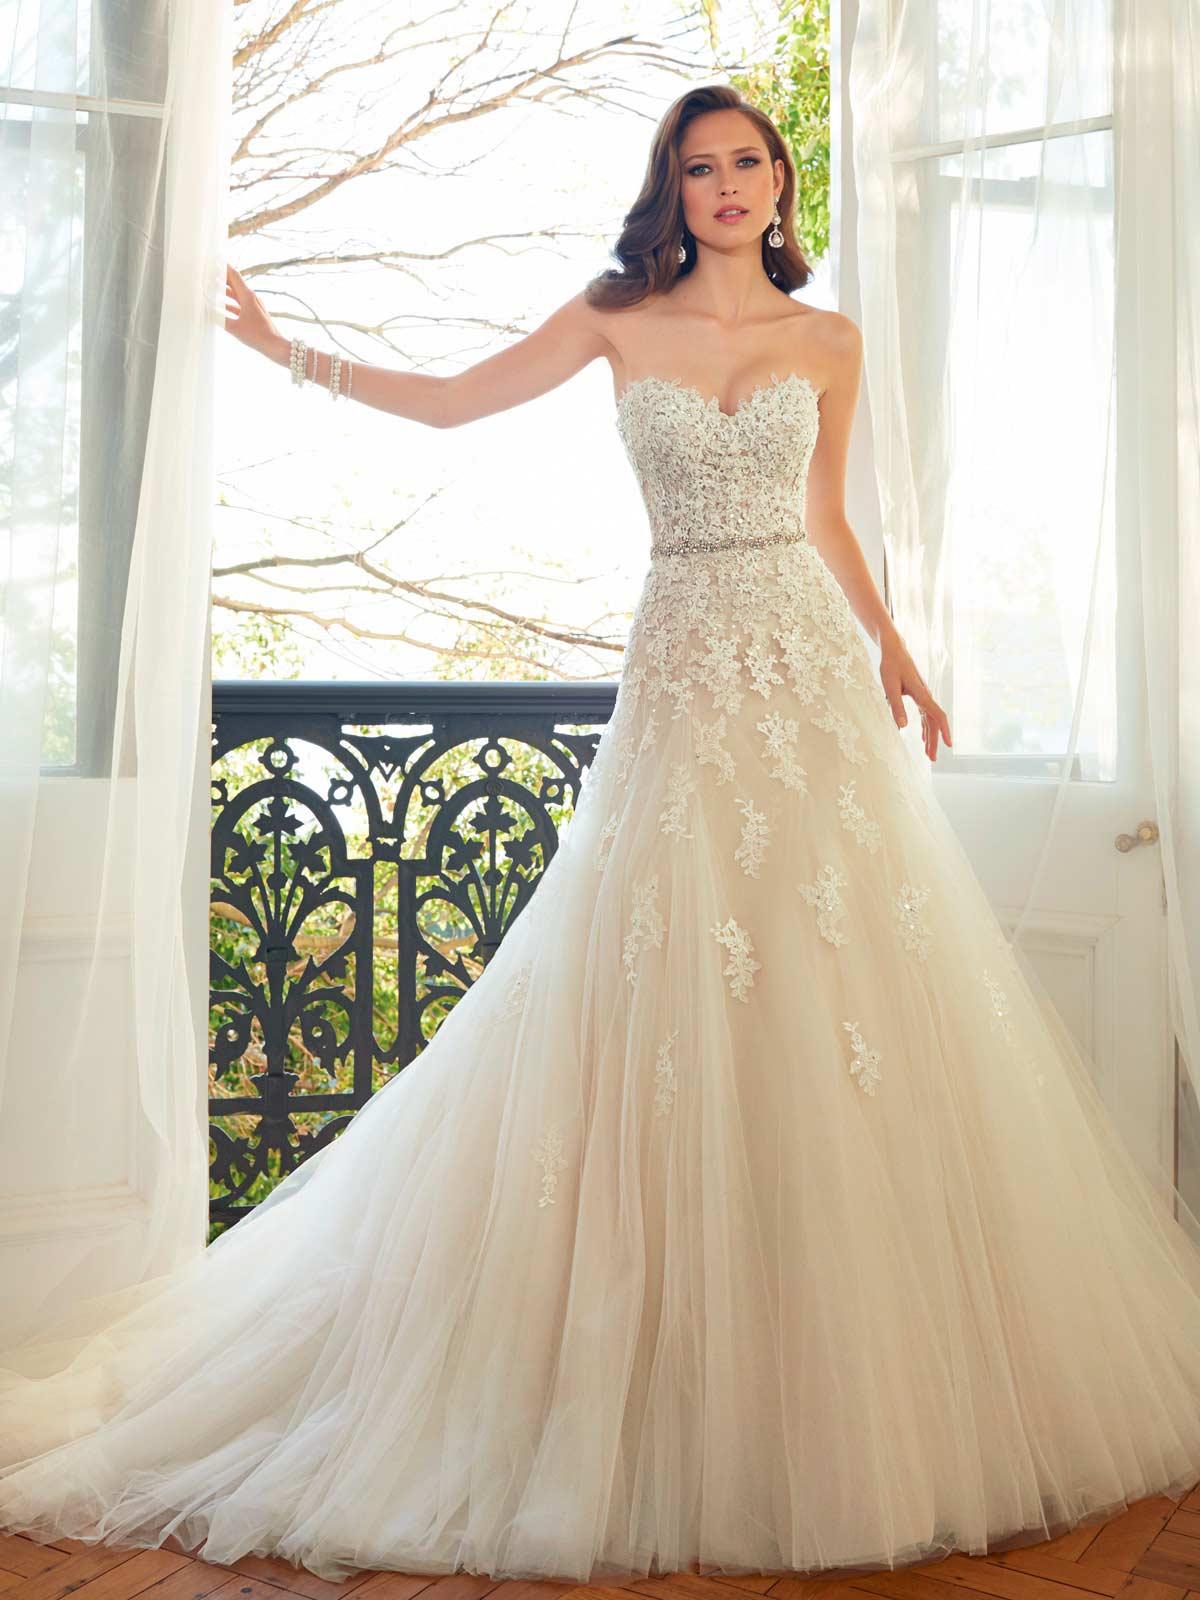 ec9e5a87a77 Sophia Tolli Spring 2015 Wedding Gowns